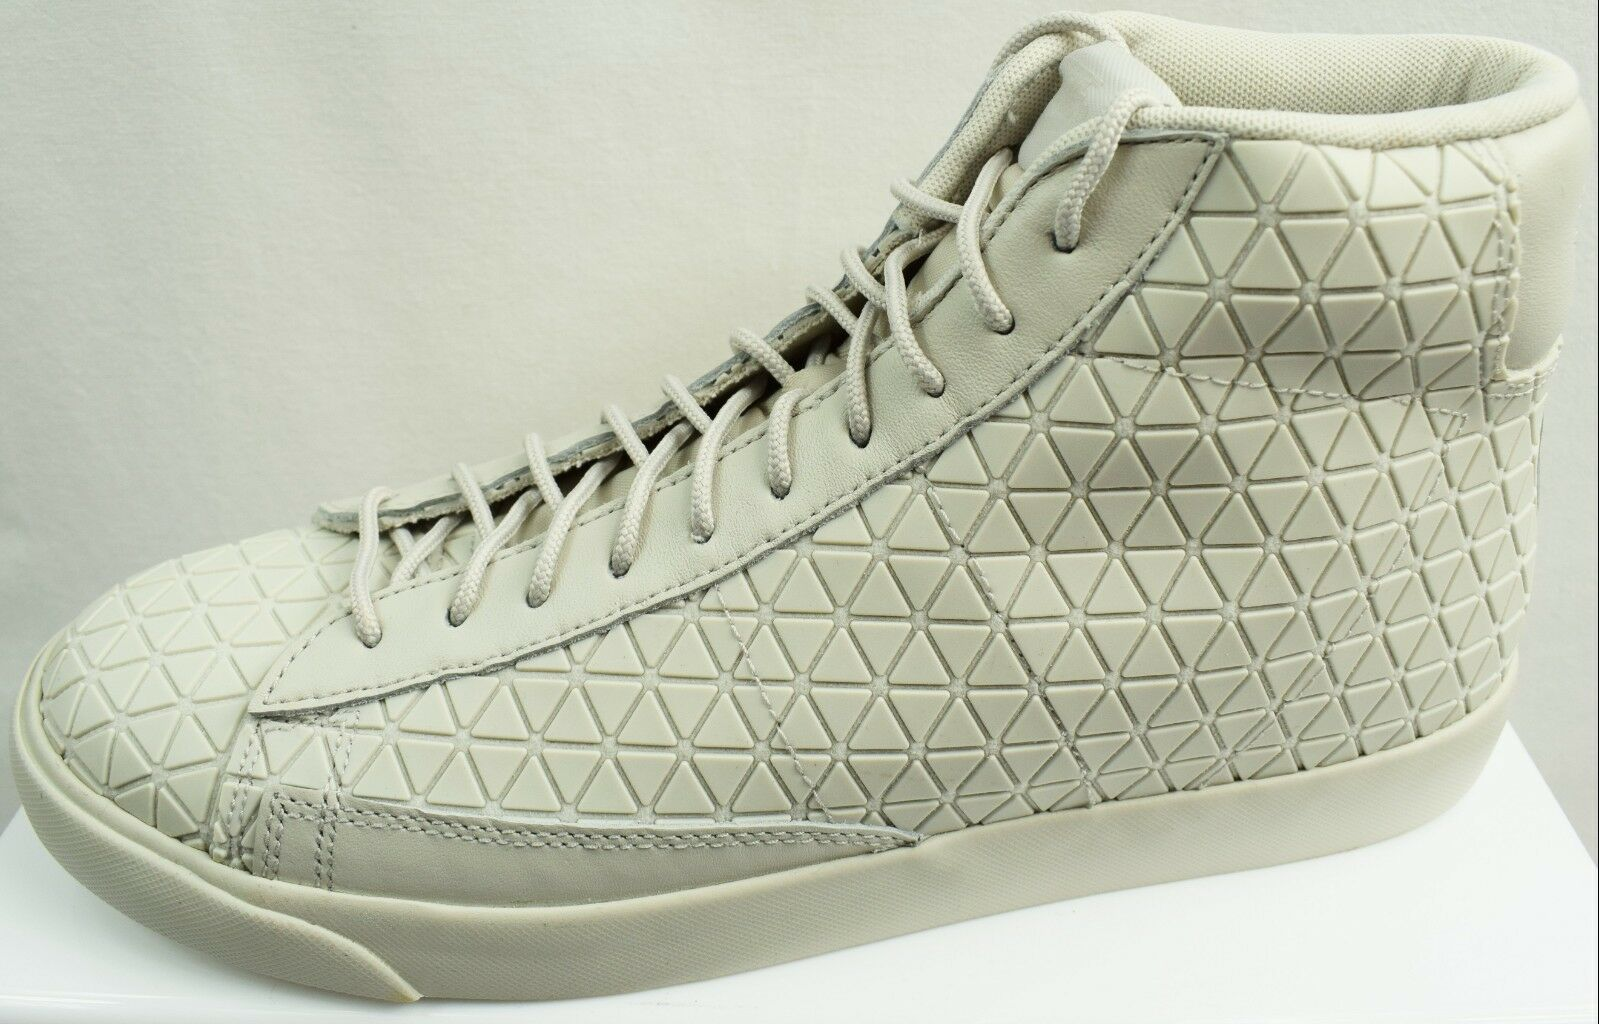 NIKE BLAZER BRAND MID METRIC MEN'S Schuhe BRAND BLAZER NEW SIZE UK 7.5 (DA1) - S 594b20